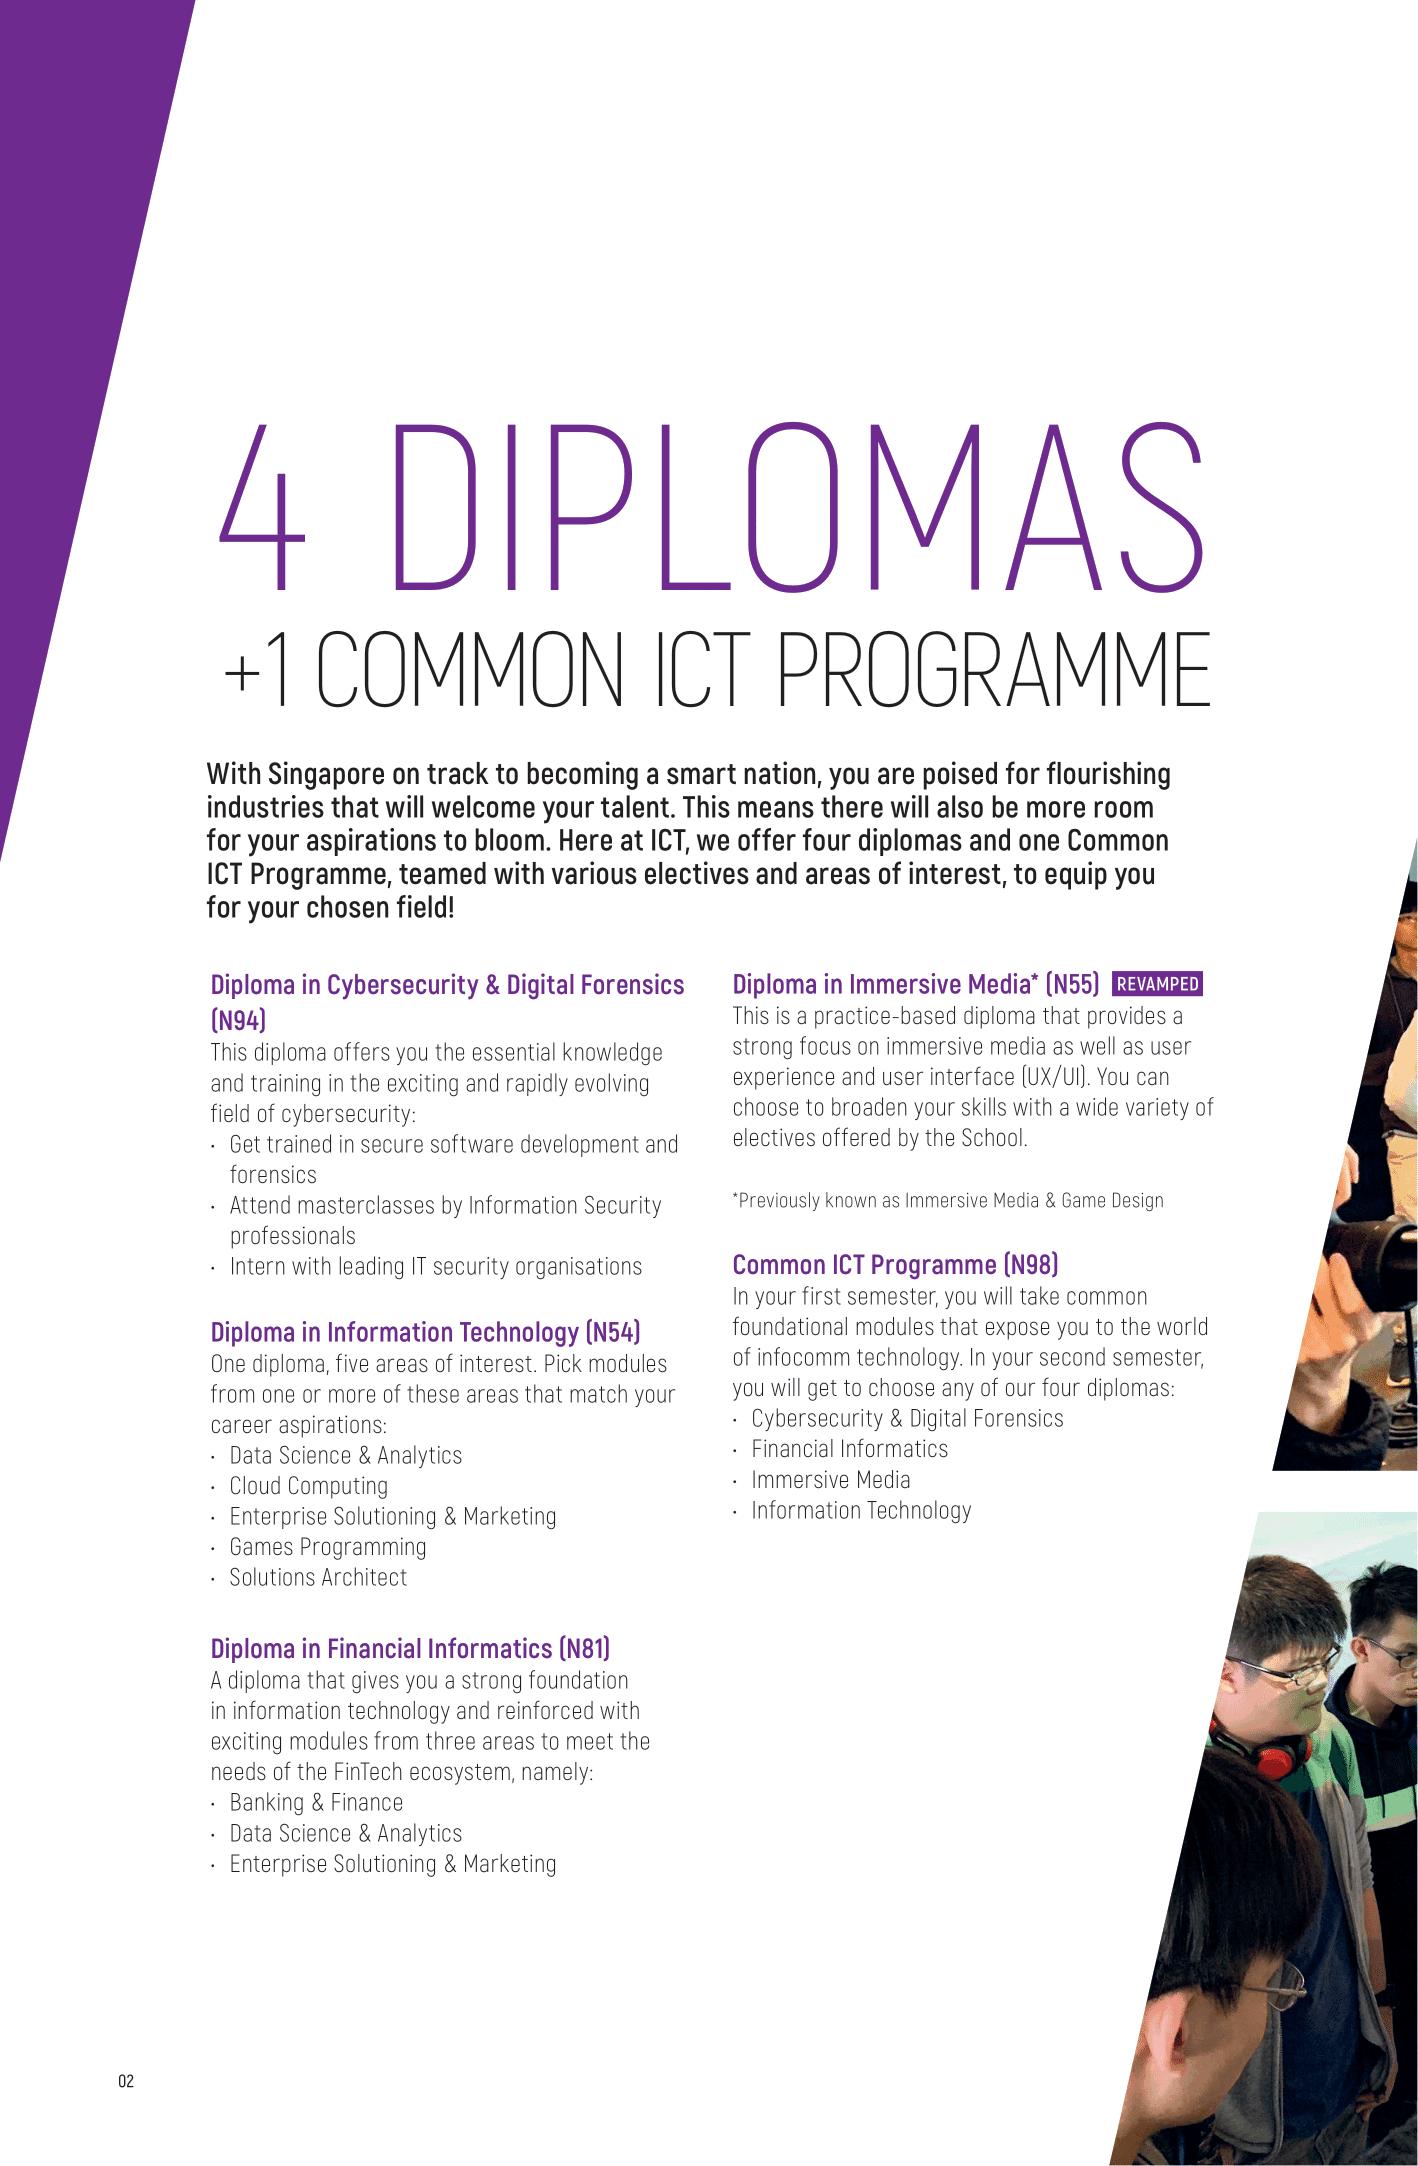 School of Infocomm Technology 2020-4